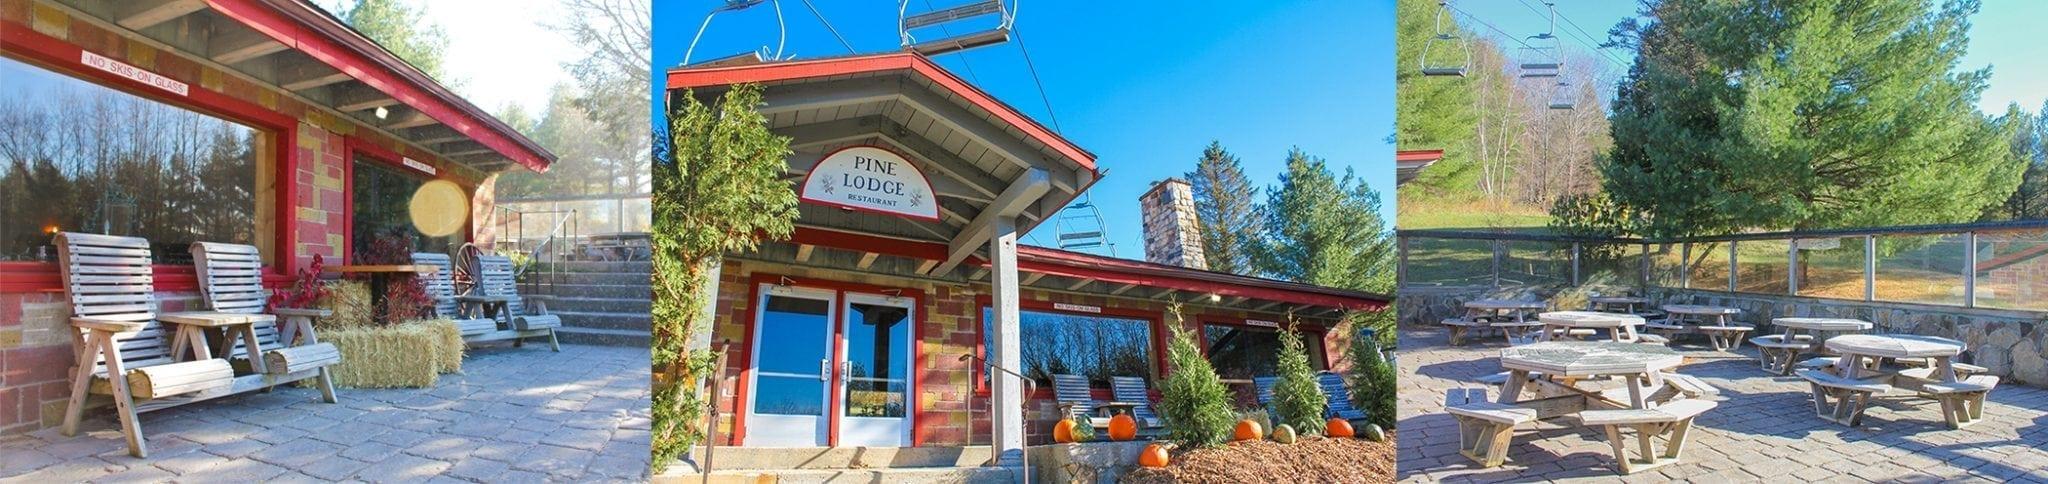 pine lodge restaurant | mohawk mountain ski area